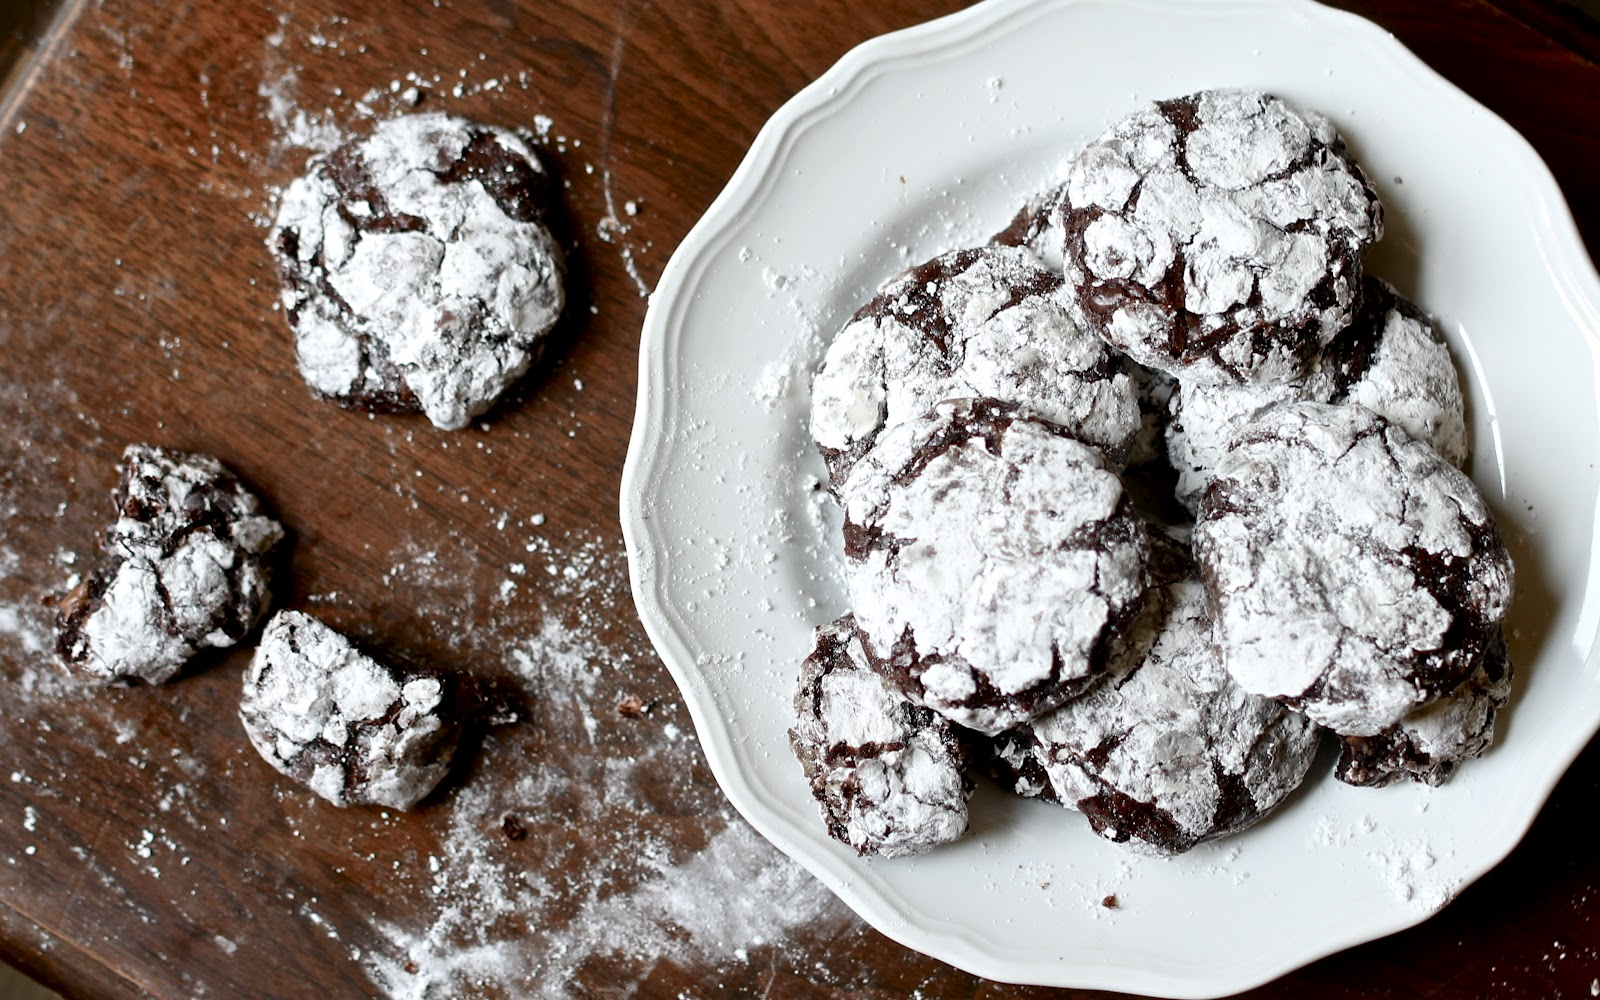 Yammie S Glutenfreedom Six Ingredient Chocolate Fudge